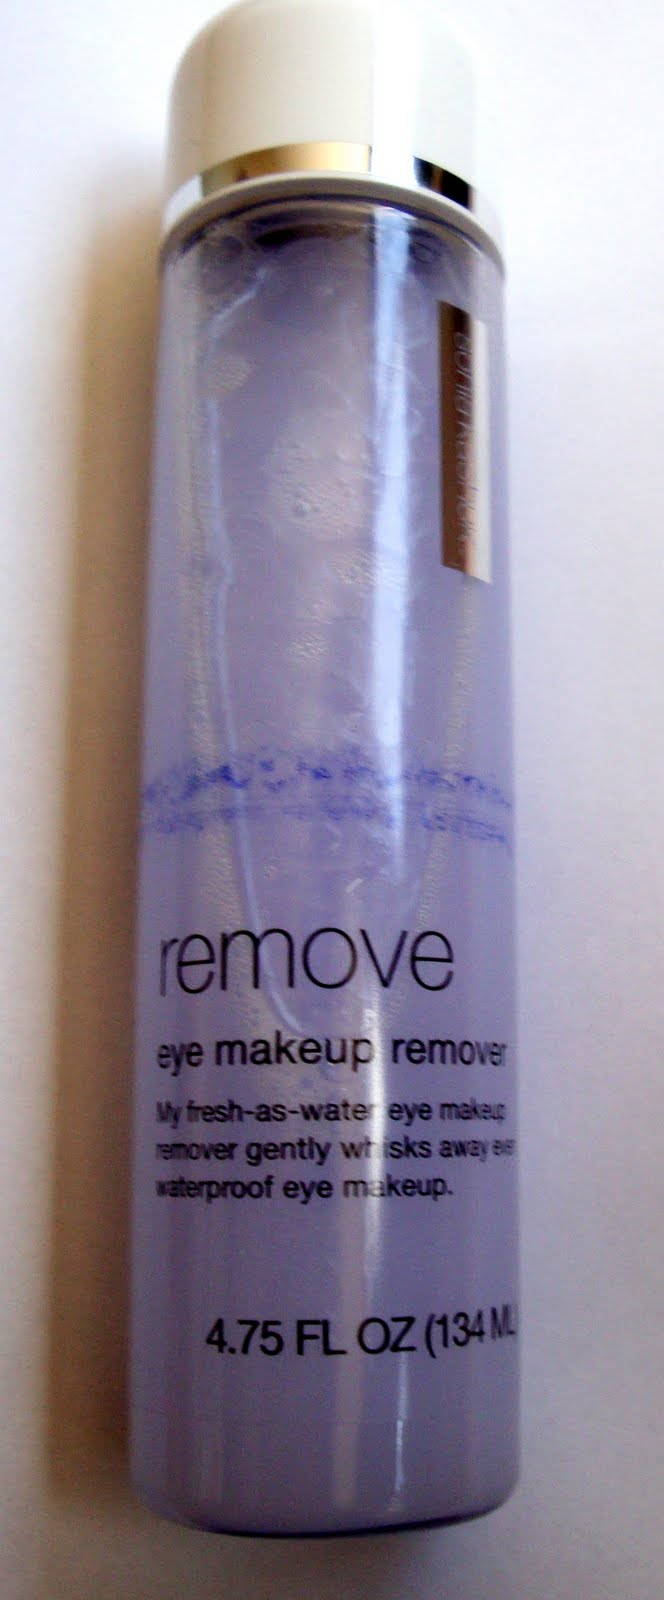 College Cosmetic: Easter Basket Haul: MAC Lipstick, Duo Lash Glue ...